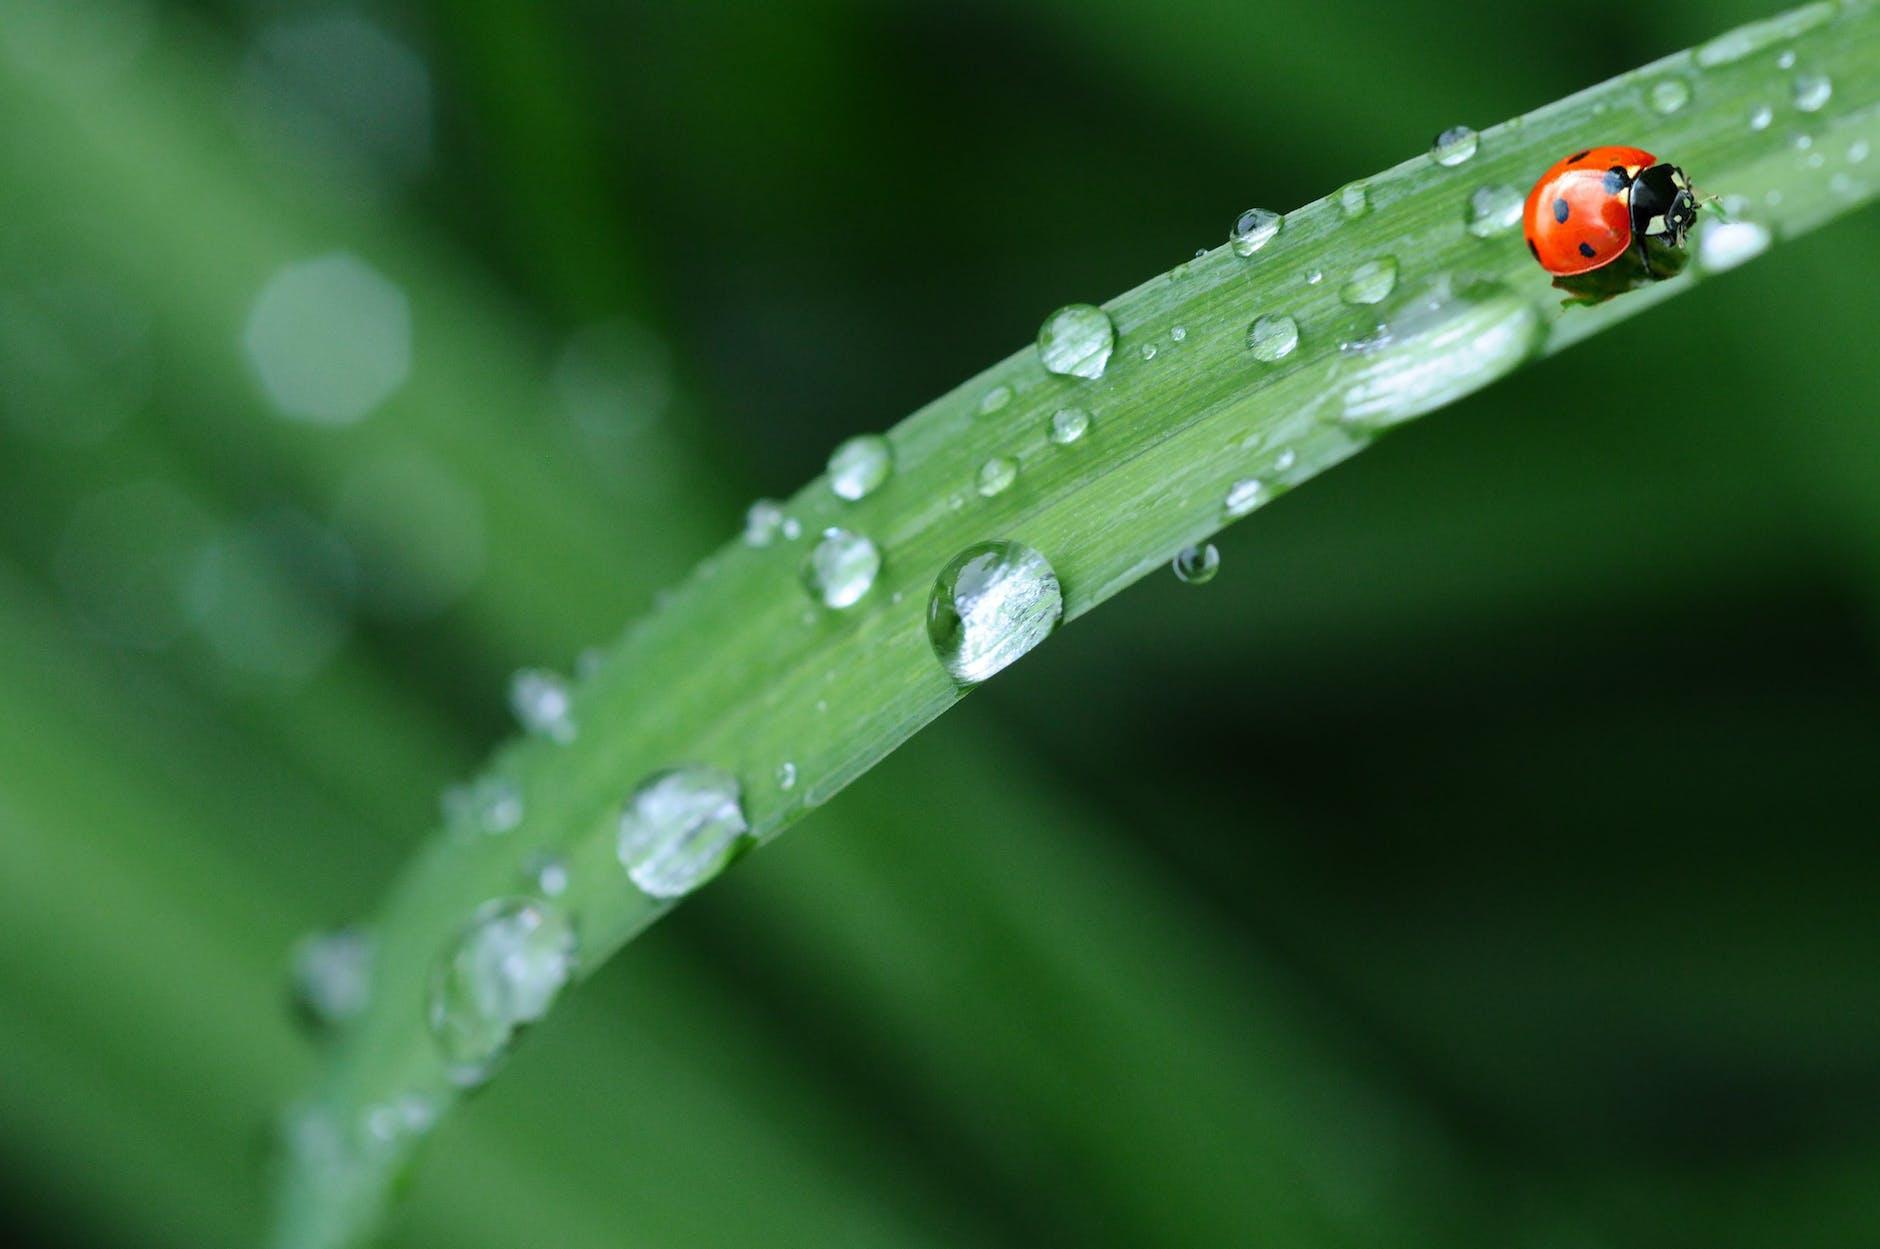 https://images.pexels.com/photos/40731/ladybug-drop-of-water-rain-leaf-40731.jpeg?auto=compress&cs=tinysrgb&dpr=2&h=650&w=940